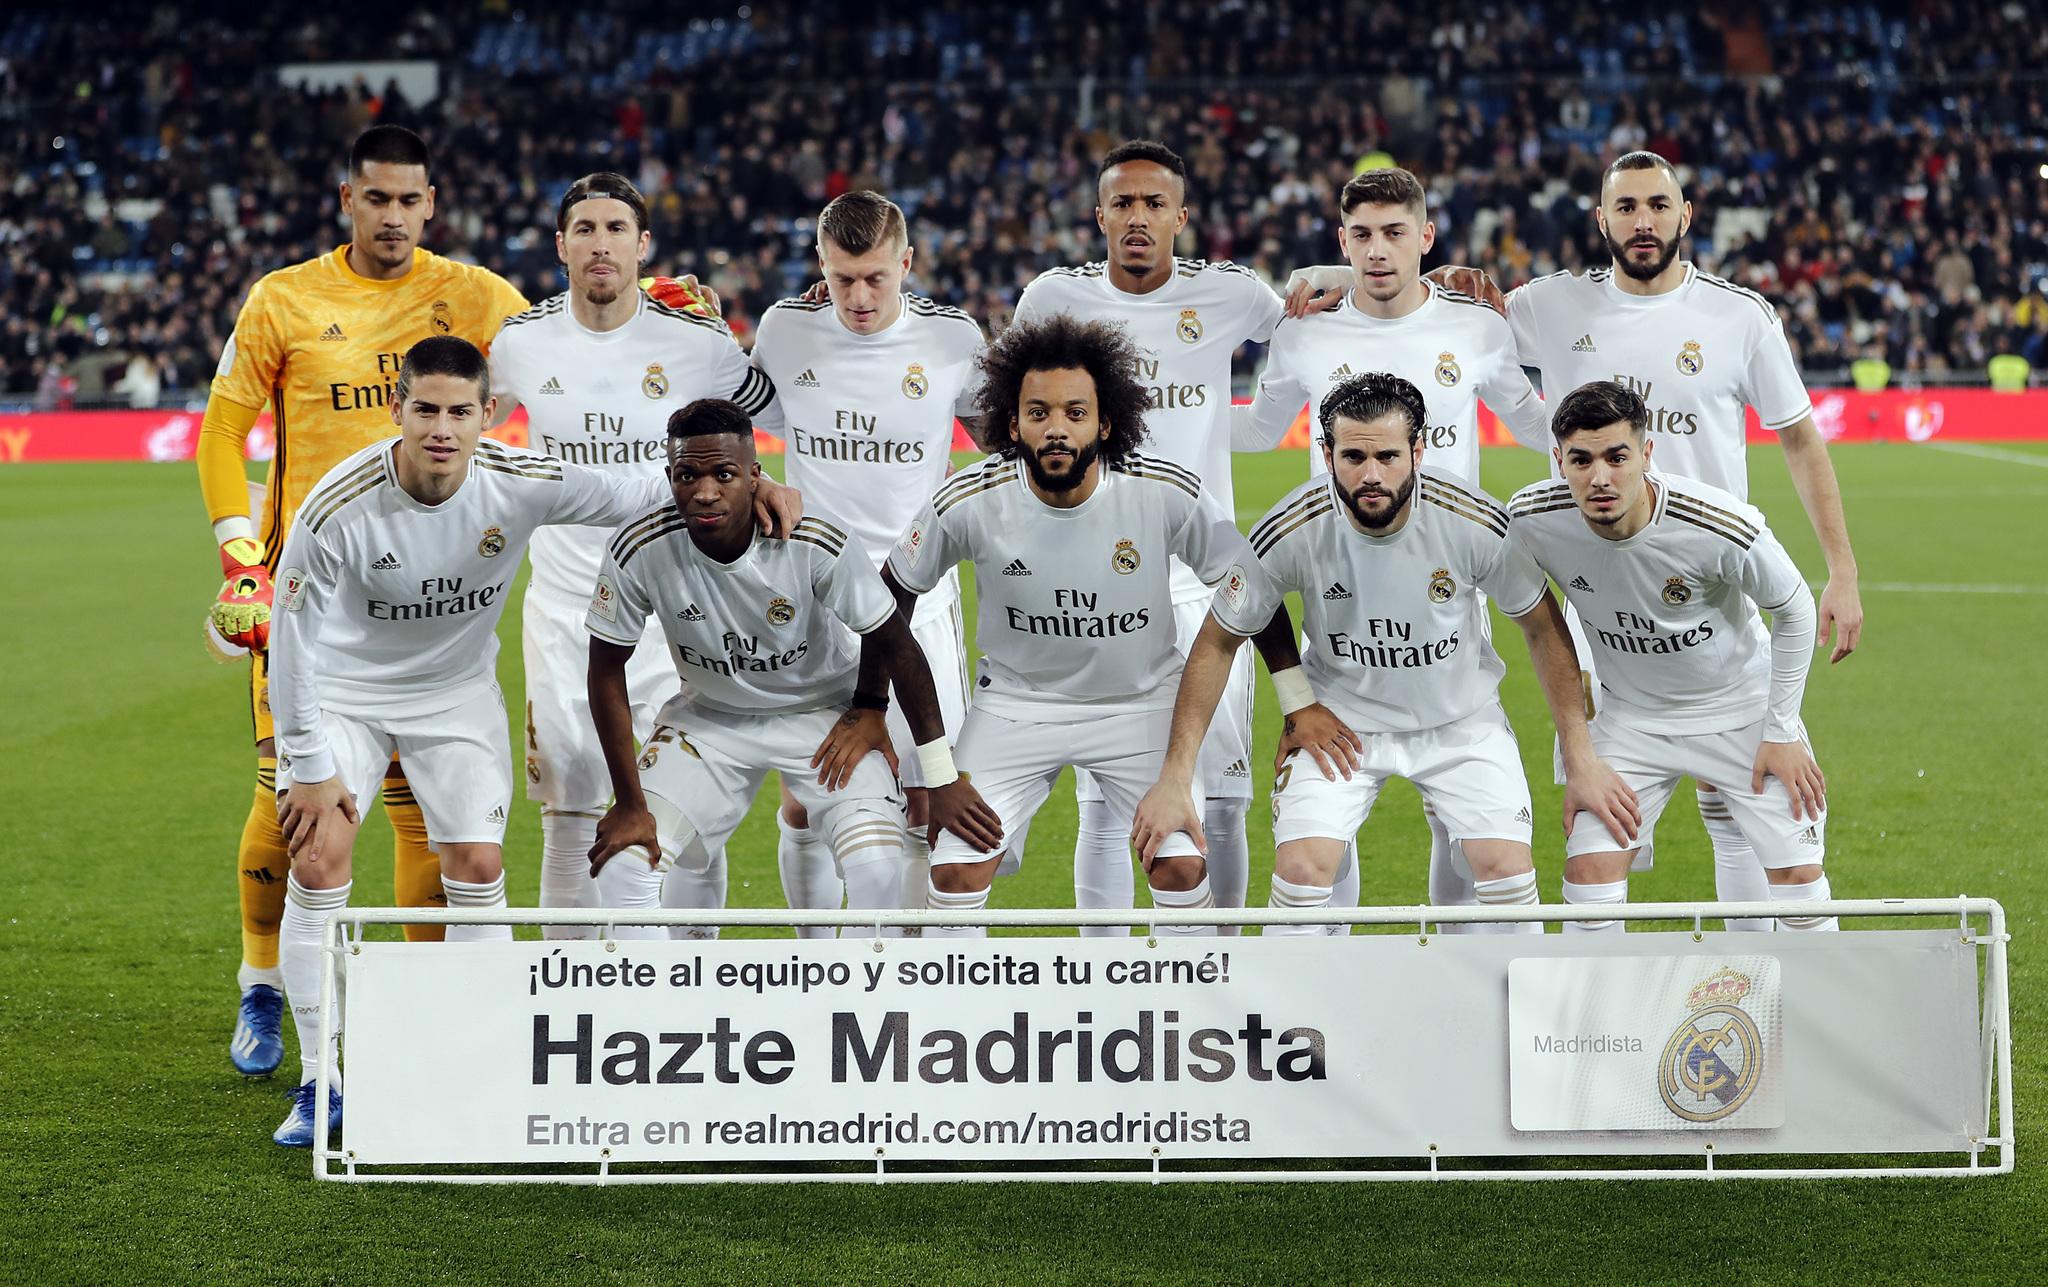 Real Madrid Vs Real Sociedad Real Madrid Ratings Vs Real Sociedad